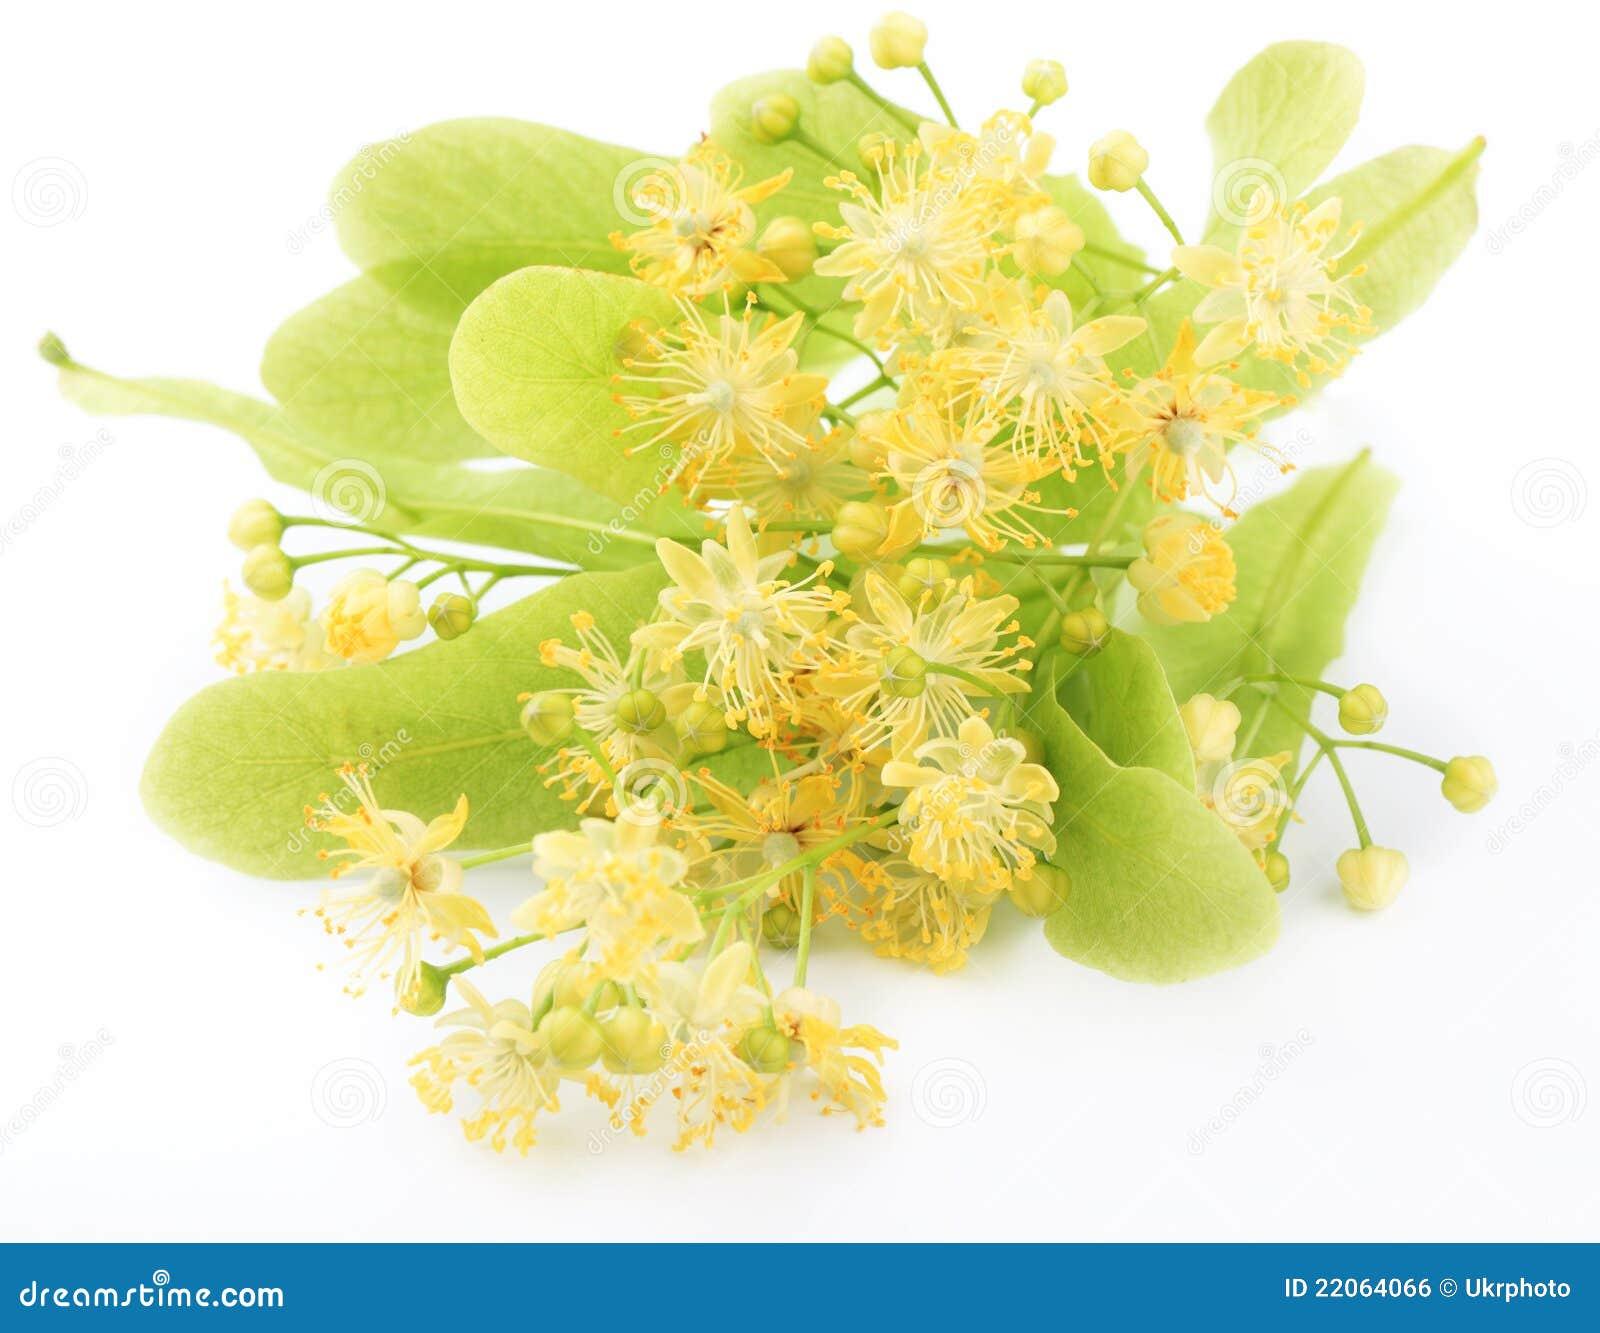 Linden Flowers Royalty Free Stock Image Image